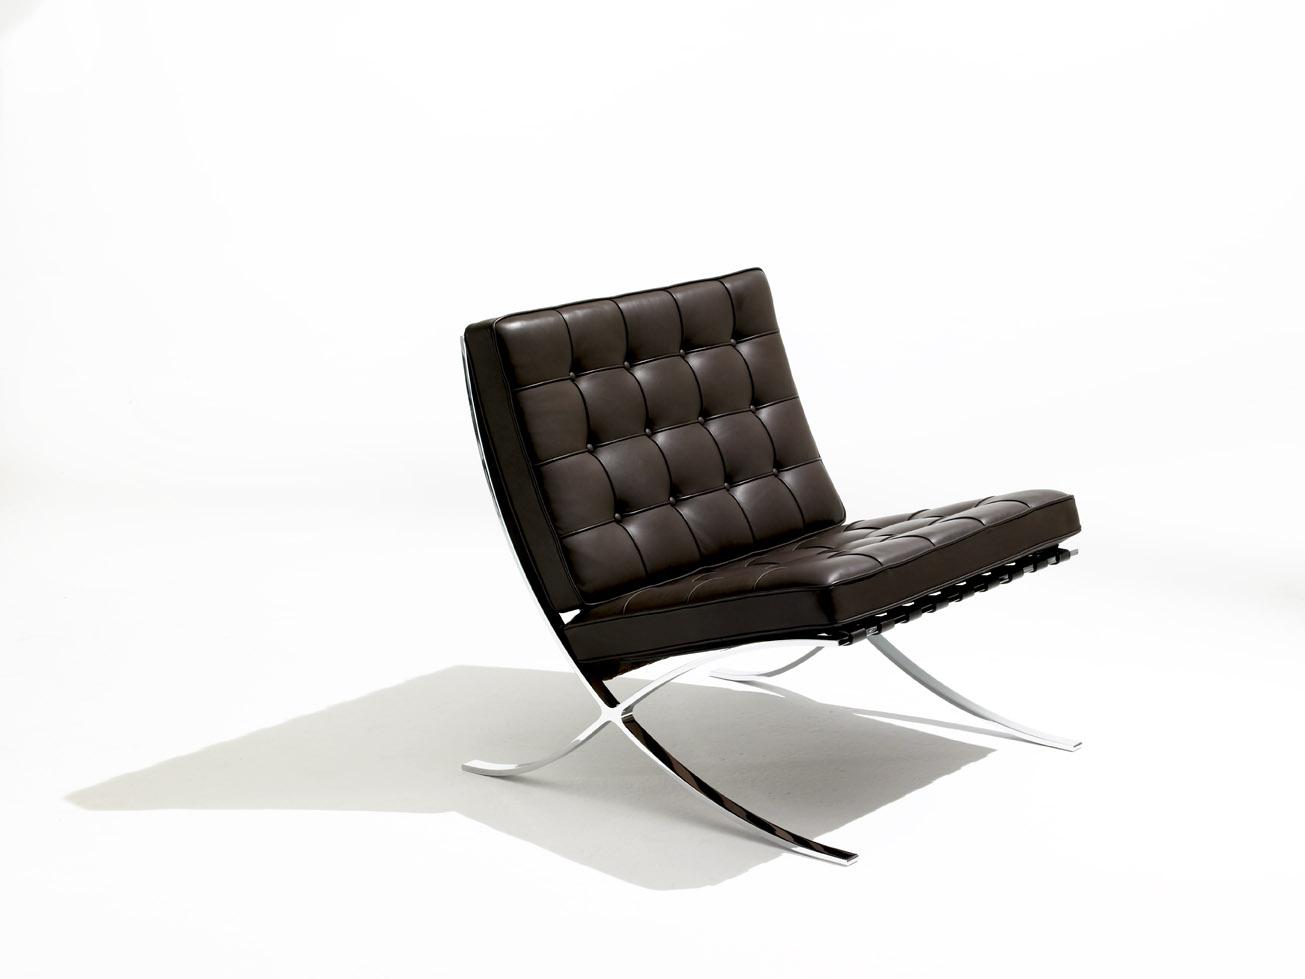 Knoll barcelona chair modern furniture houston texas - Movimiento moderno ...